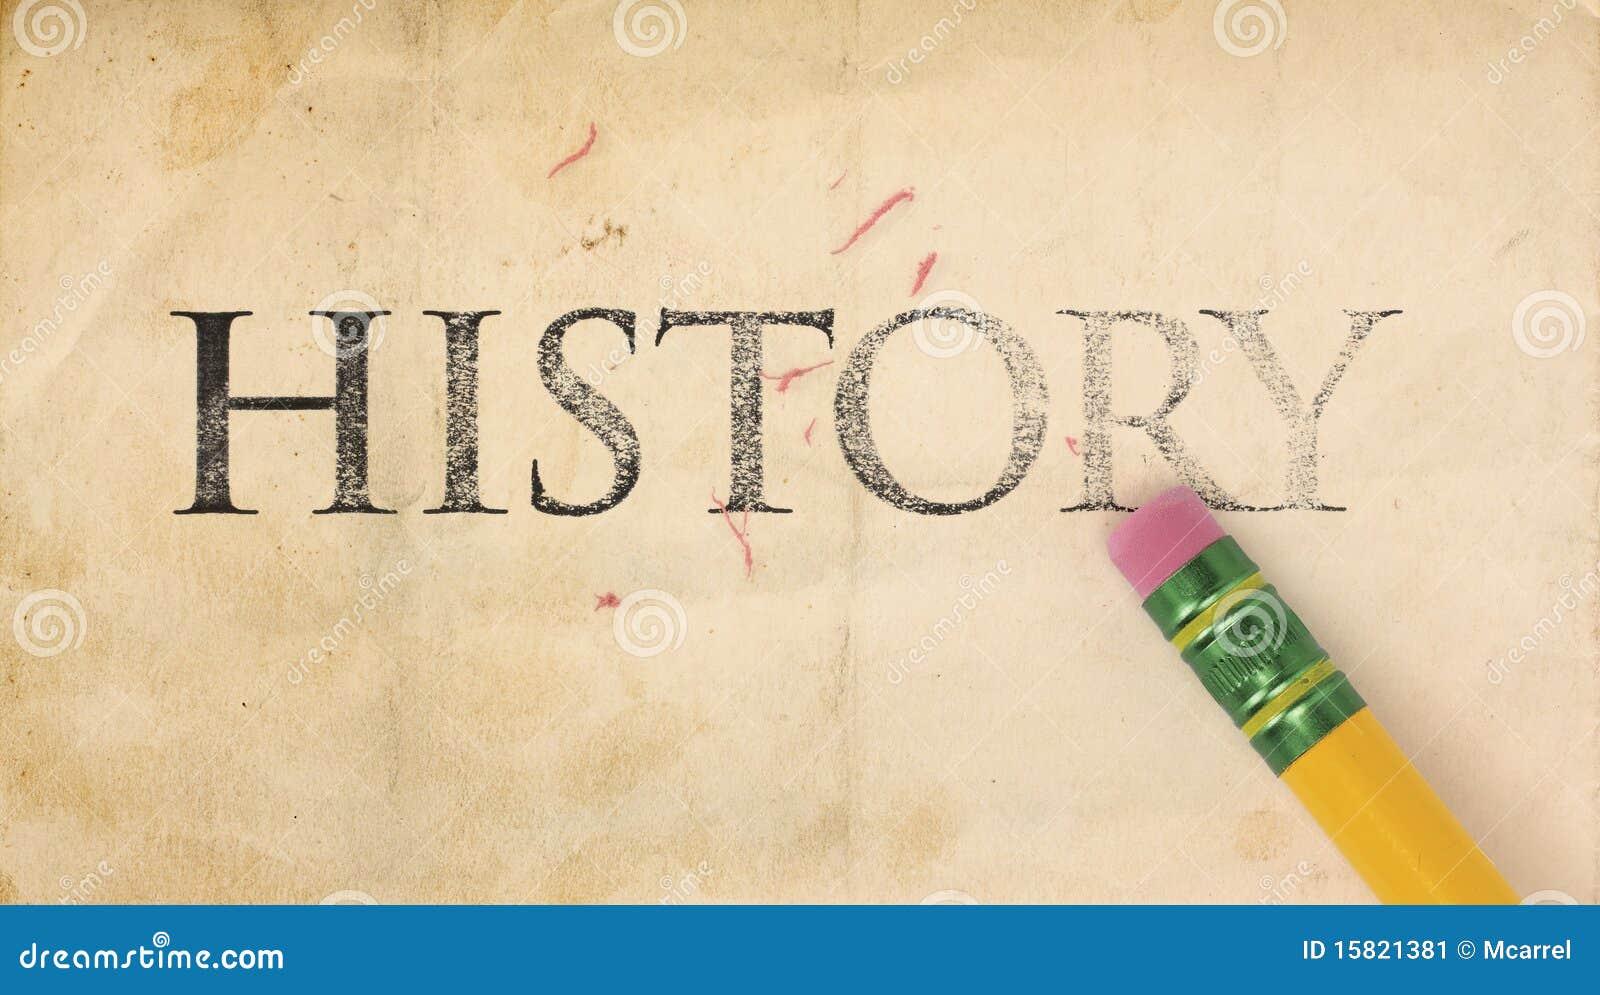 erasing history 15821381